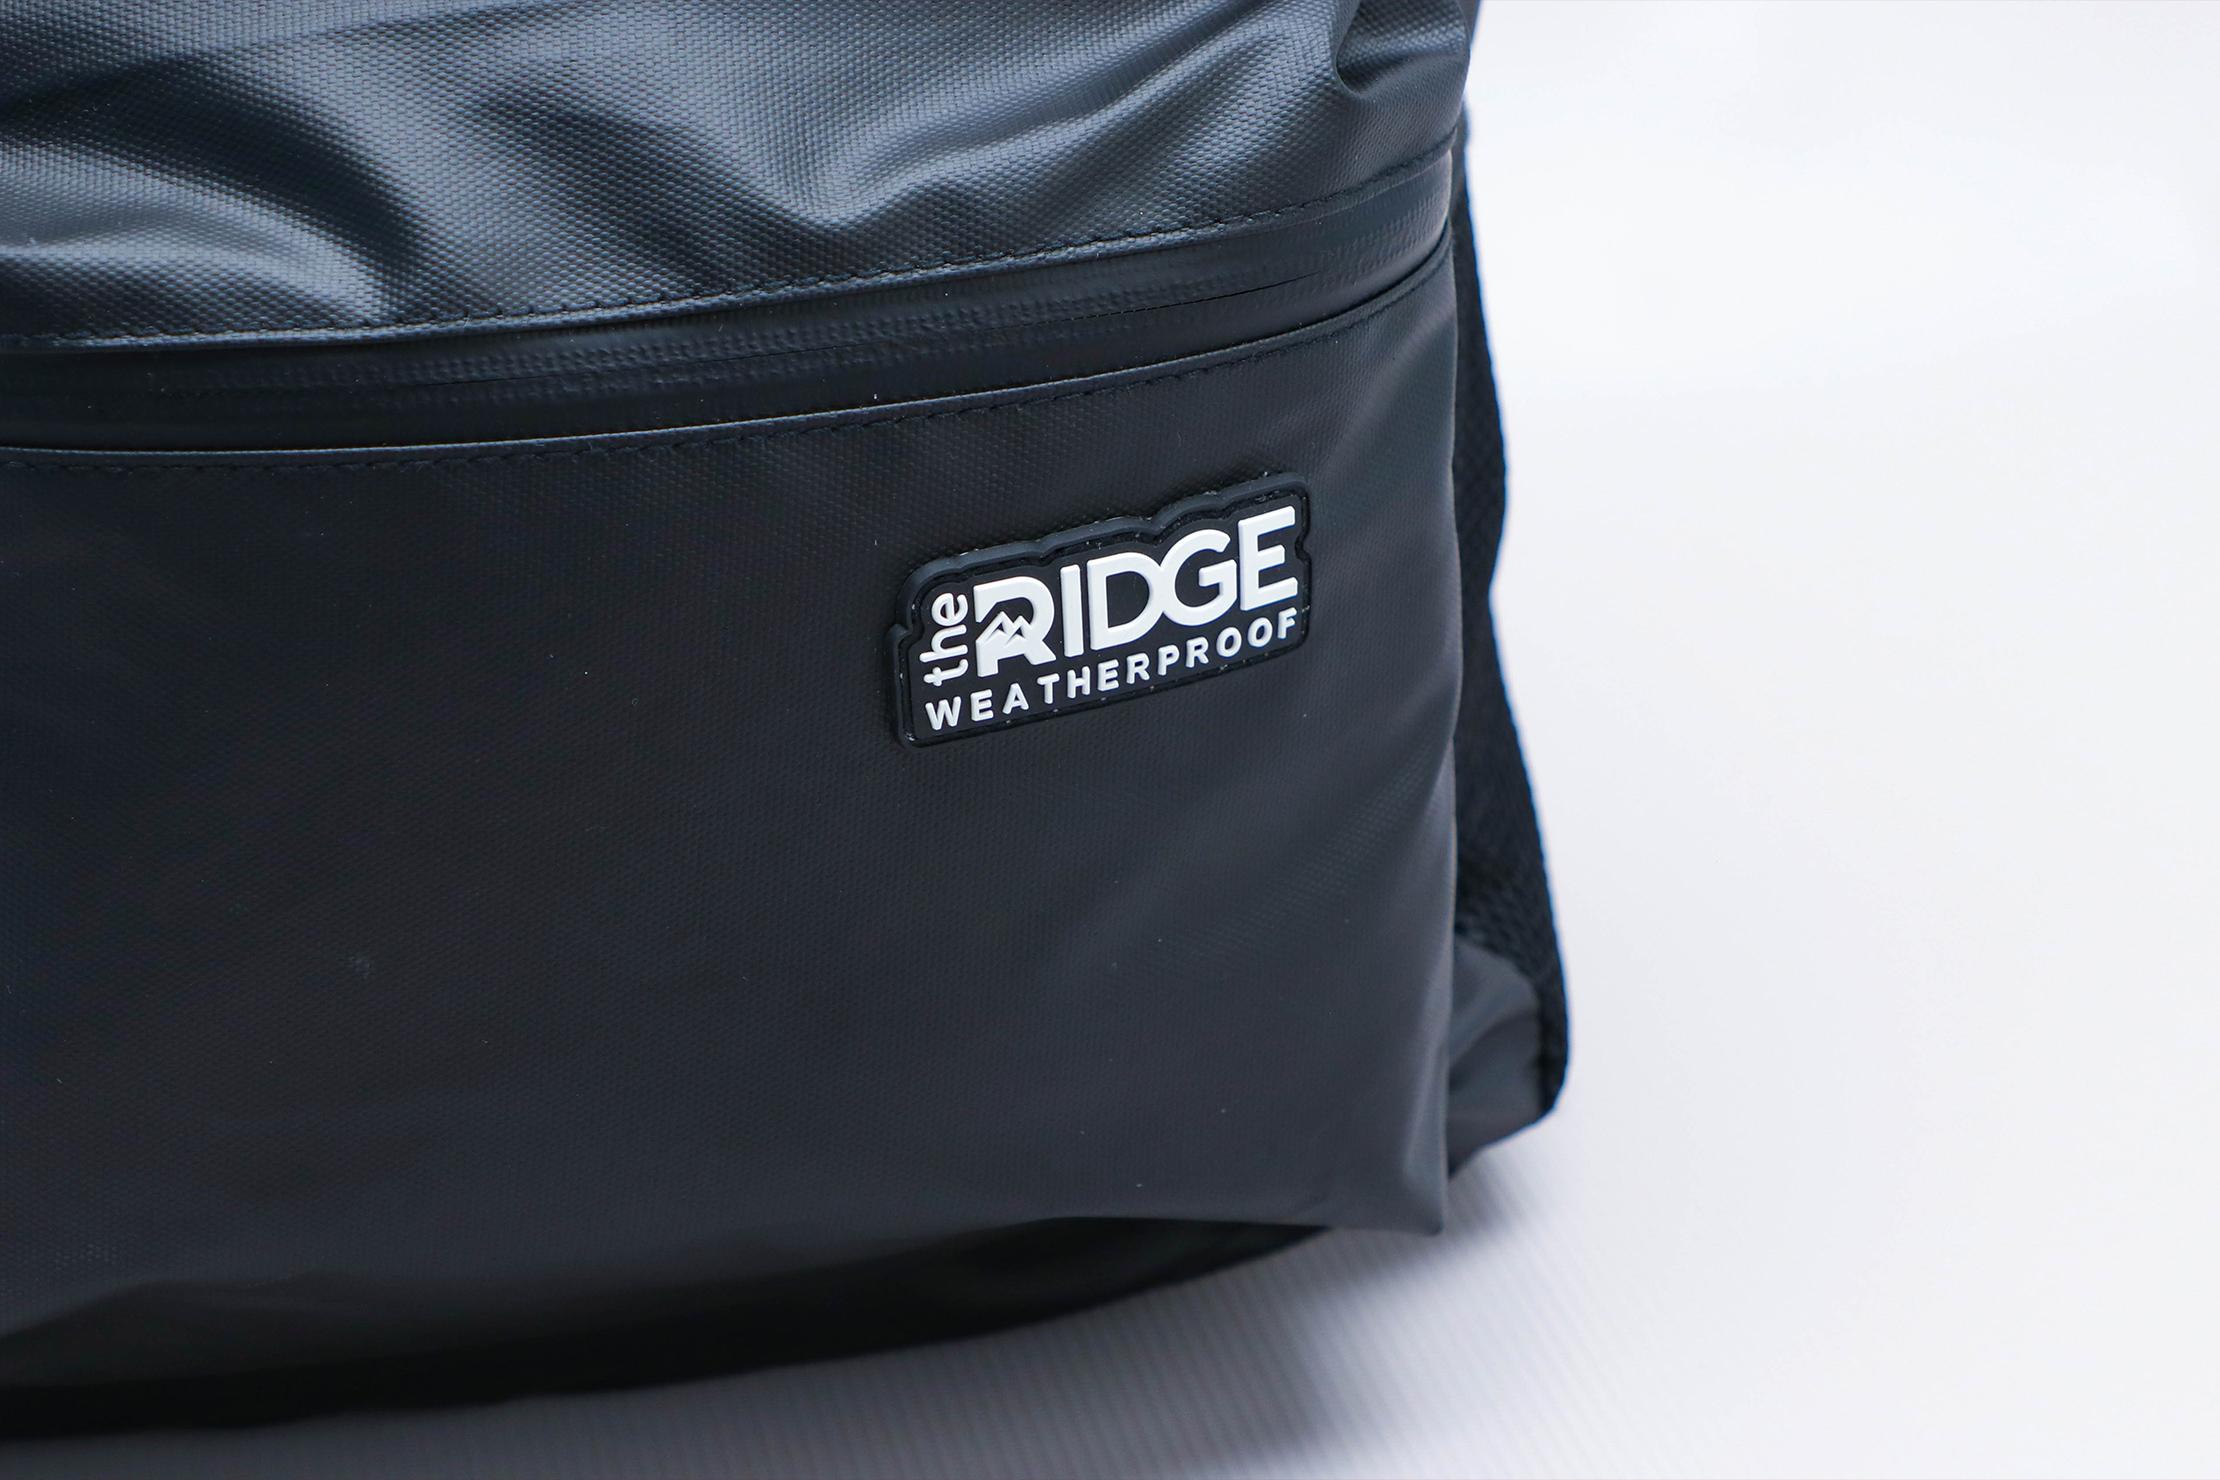 The Ridge Classic Backpack Weatherproof Logo